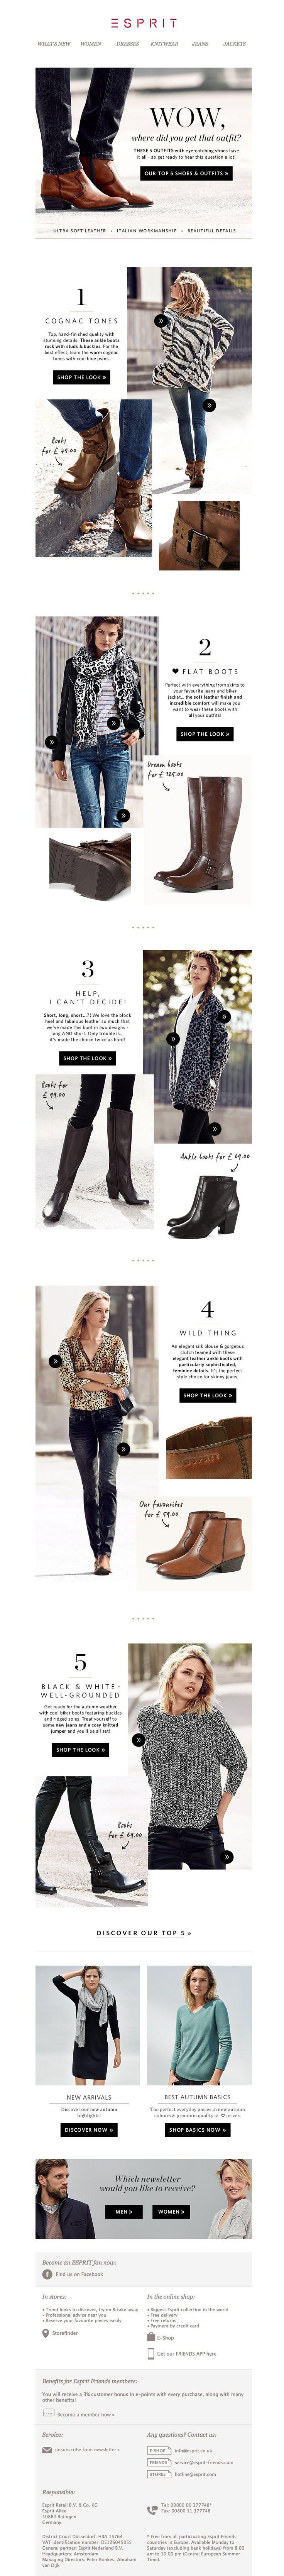 #newsletter Esprit 10.2014 Top 5 shoes & looks - top quality, top workmanship, top designs…